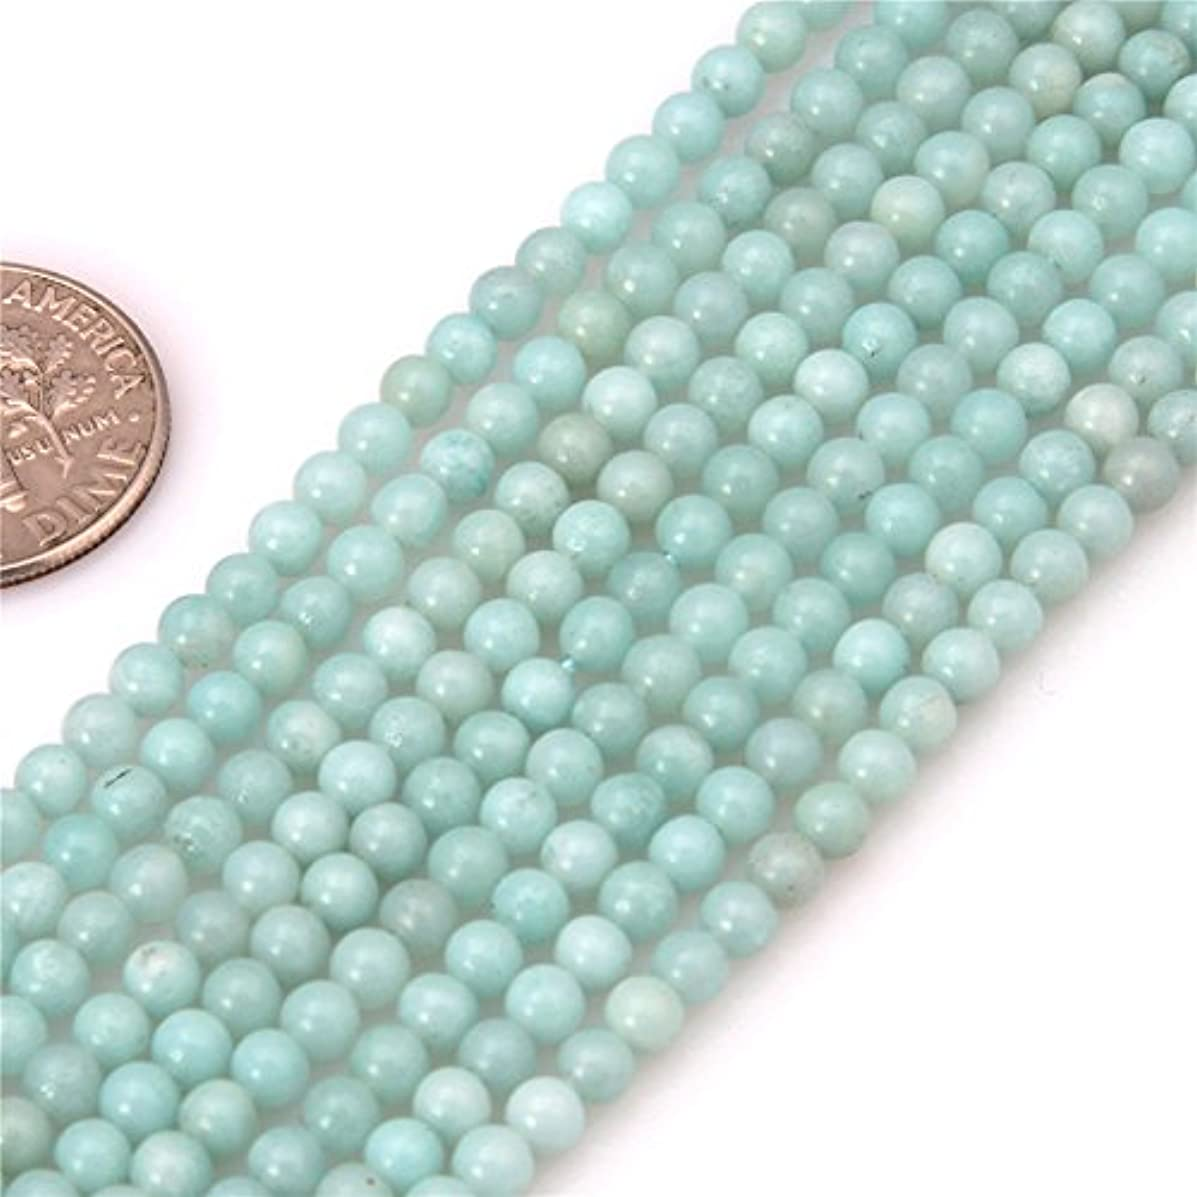 Amazonite Seed Beads for Jewelry Making Natural Gemstone Semi Precious 3mm Round 15